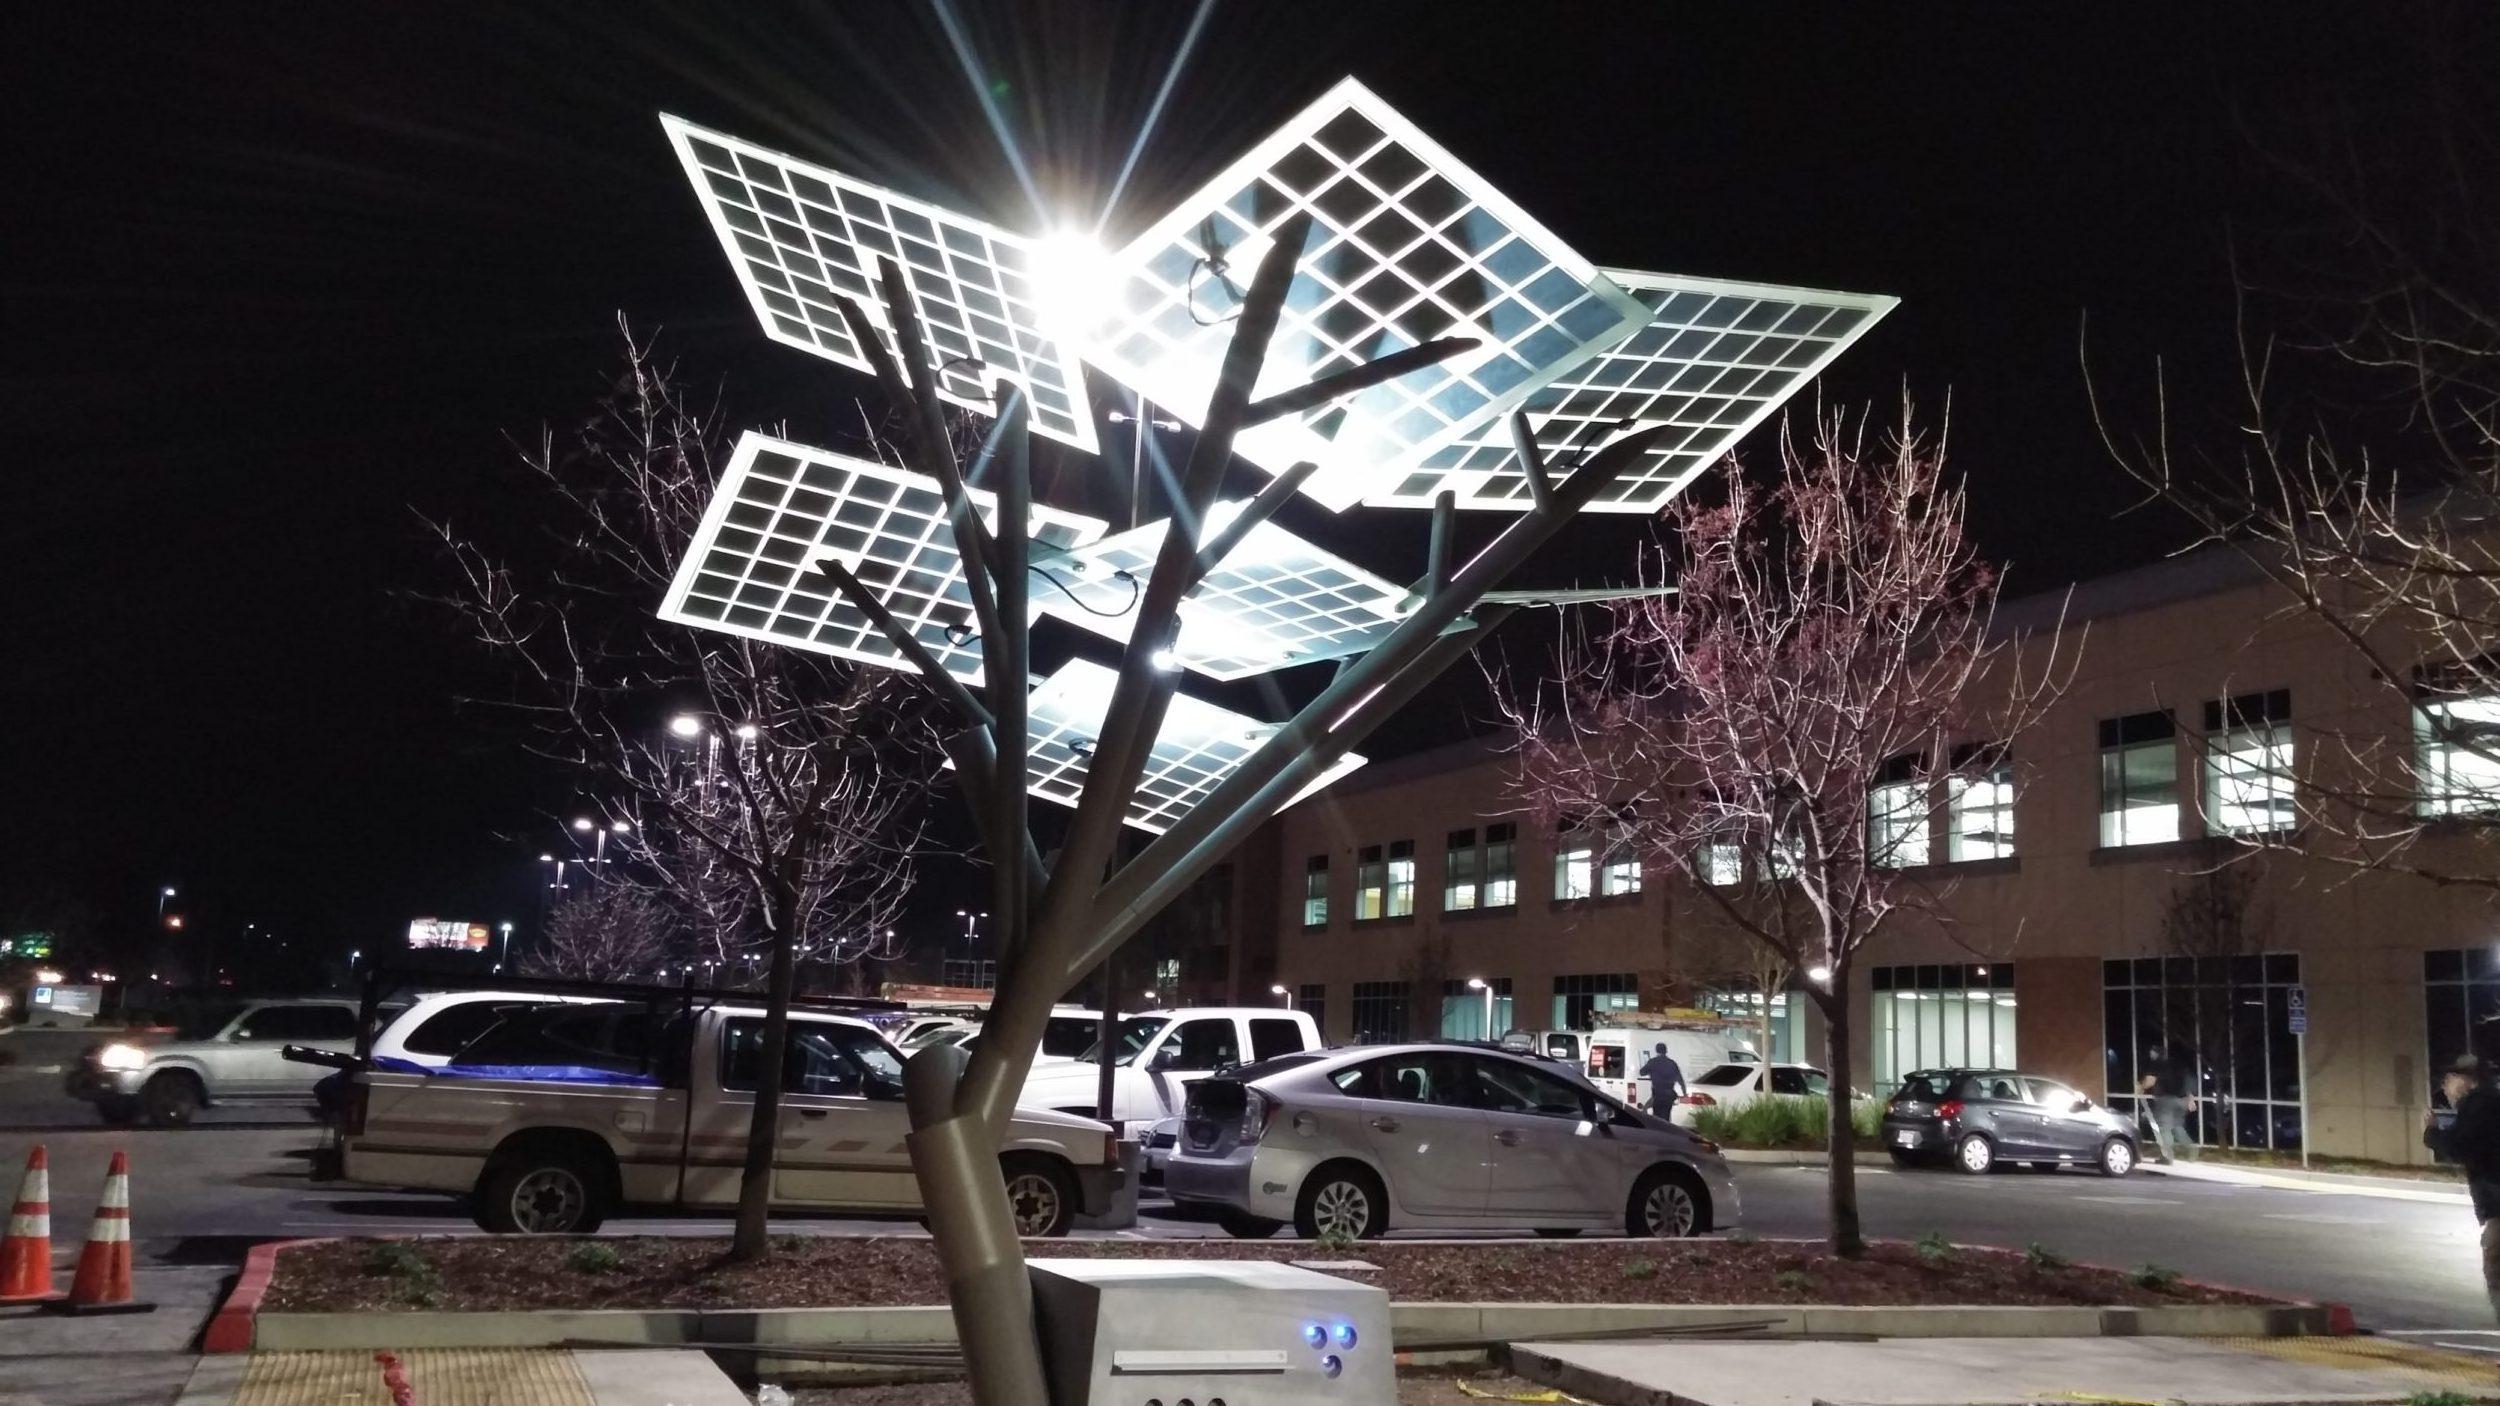 Solar tree verlichting